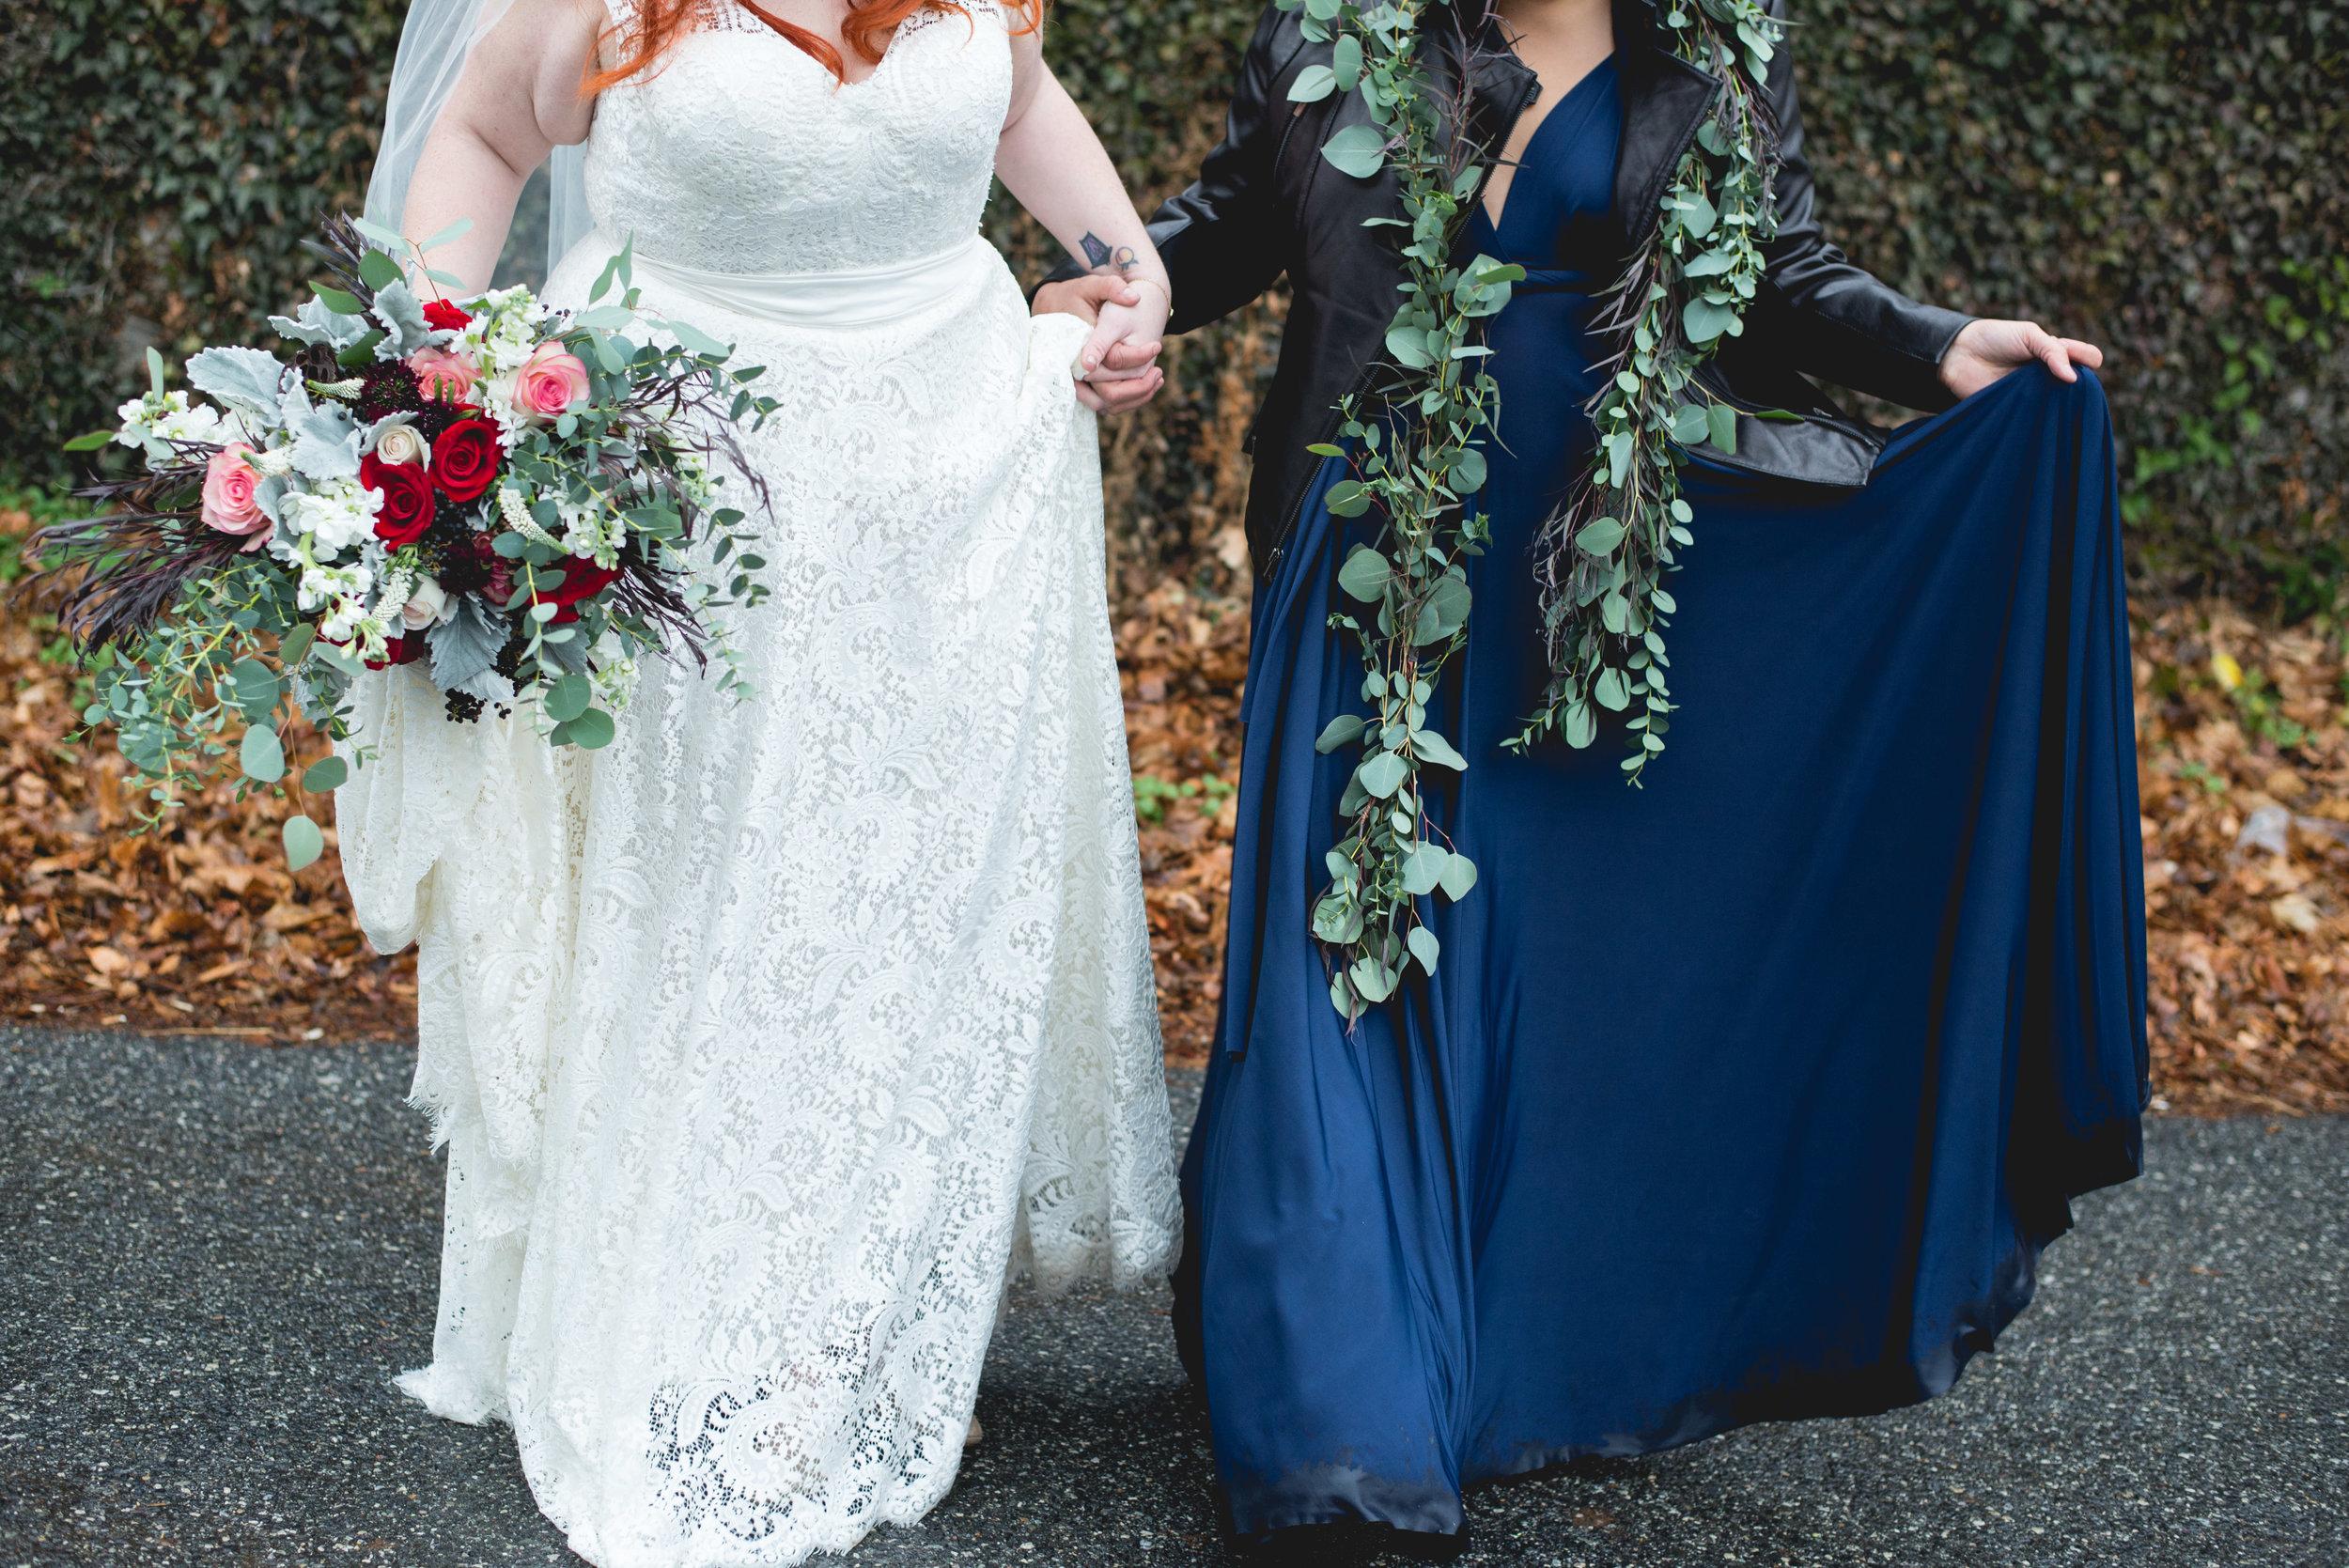 LGBTQ Philadelphia Wedding by Swiger Photography the Lesbian photographer 20